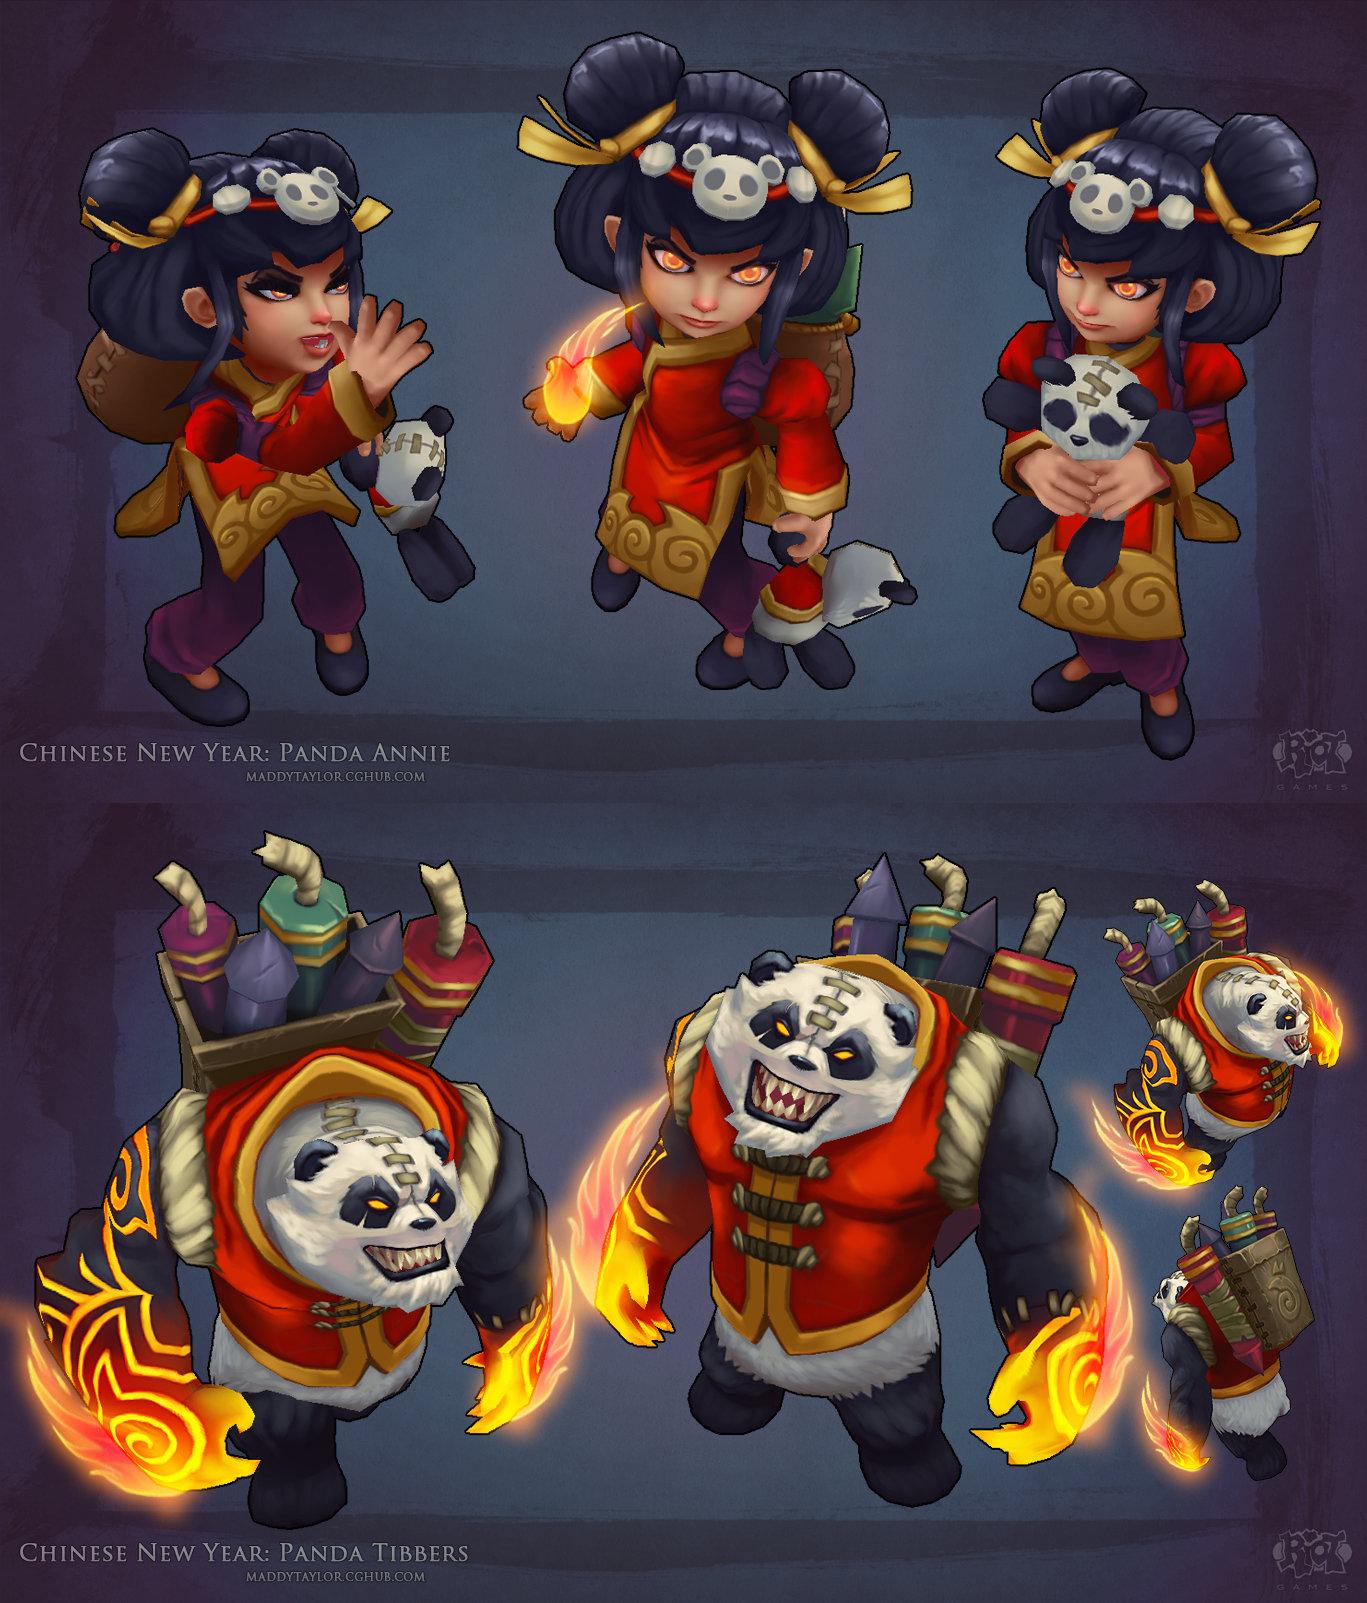 Panda annie   tibbers pose by missmaddytaylor d5sgsfo